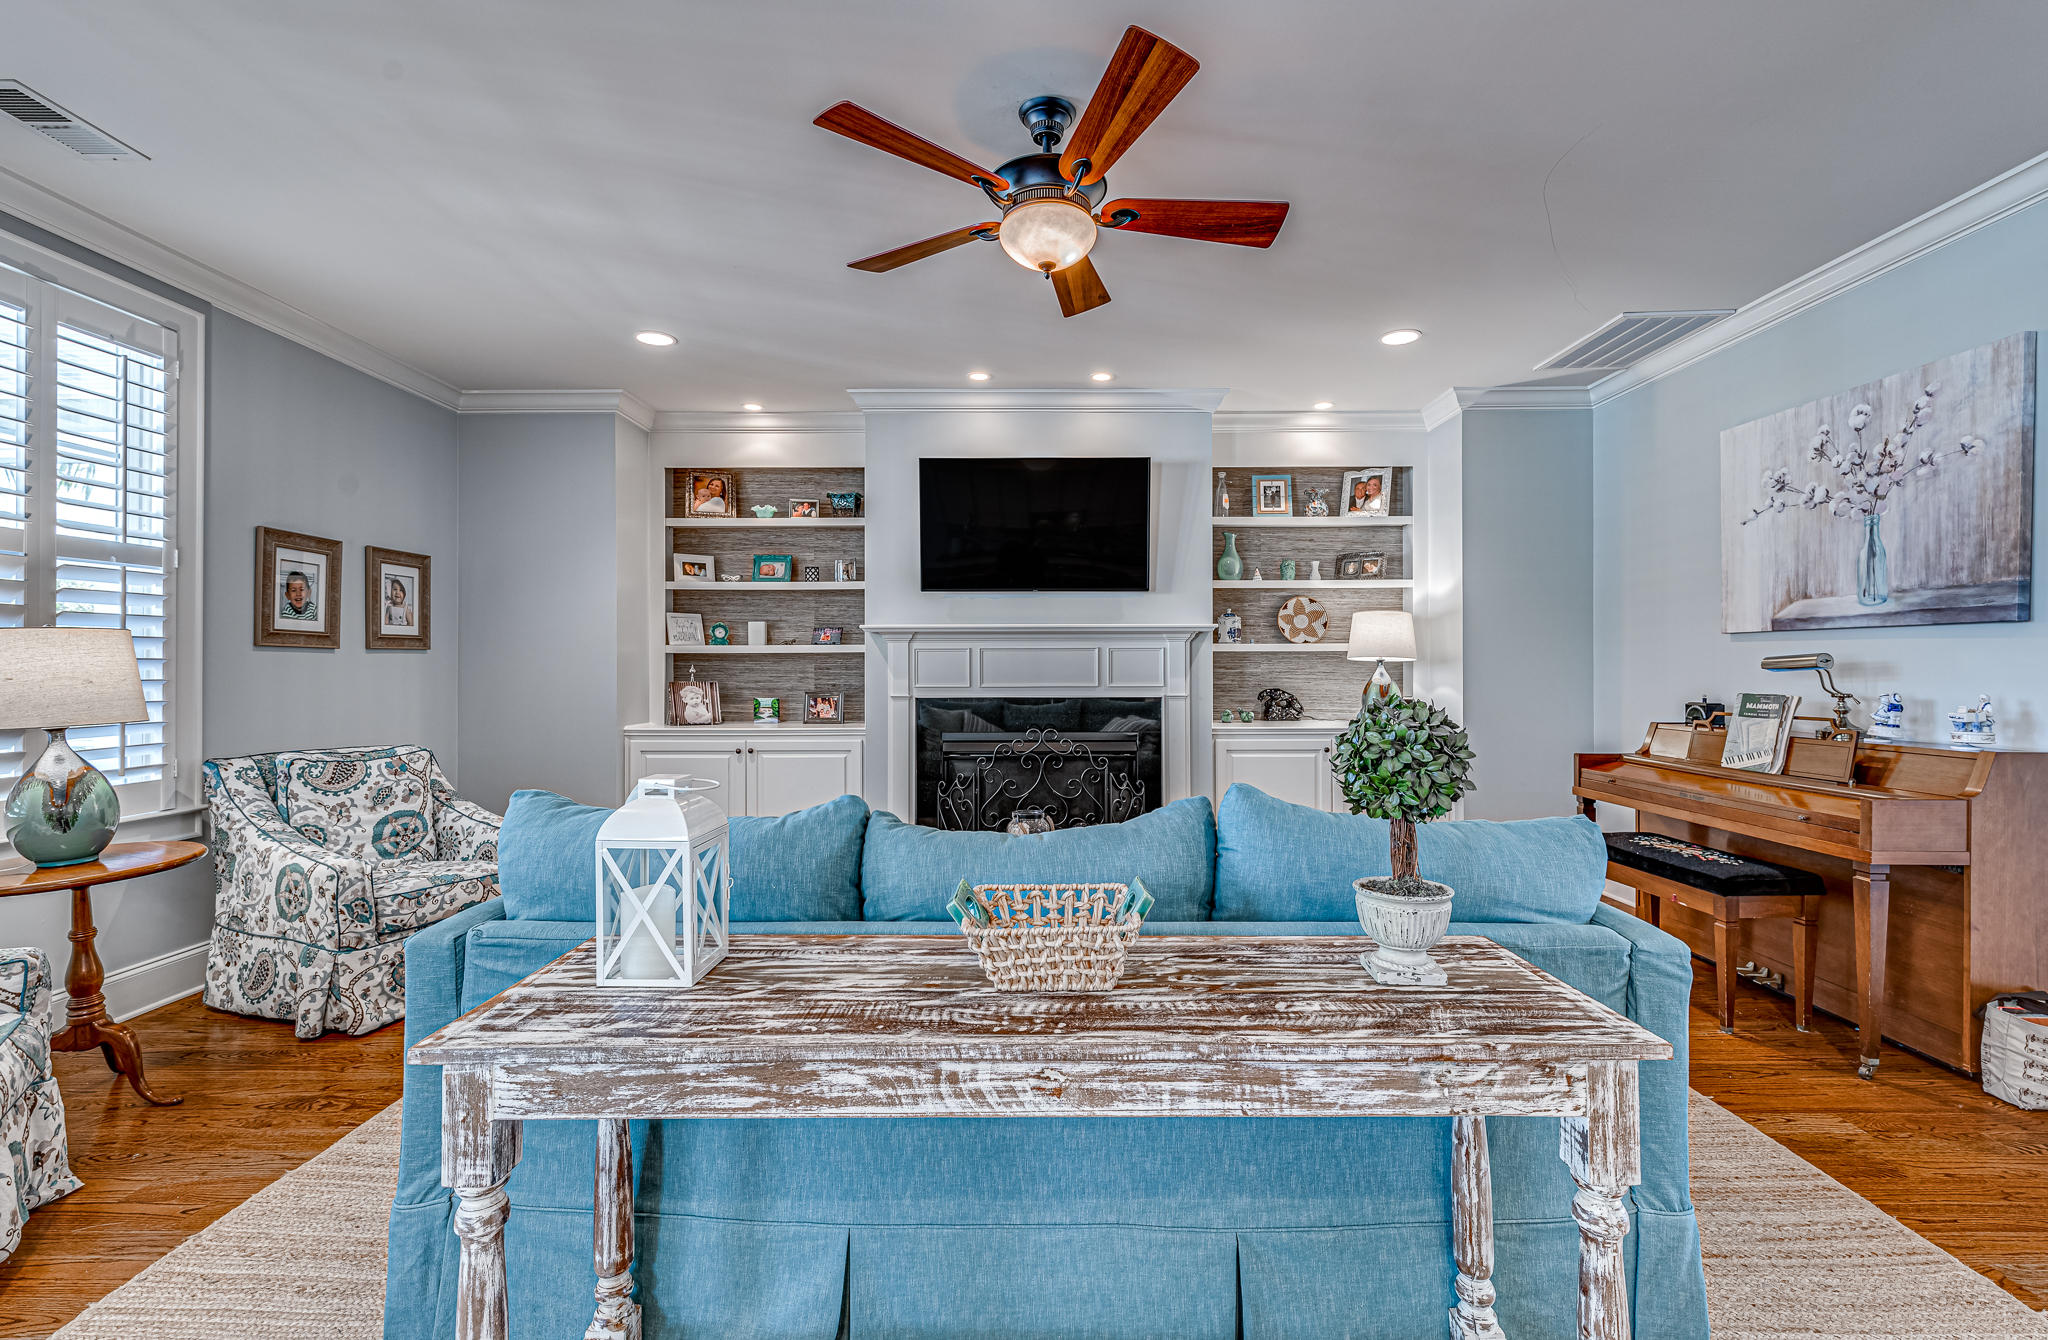 Daniel Island Smythe Park Homes For Sale - 1410 Wando View, Charleston, SC - 19